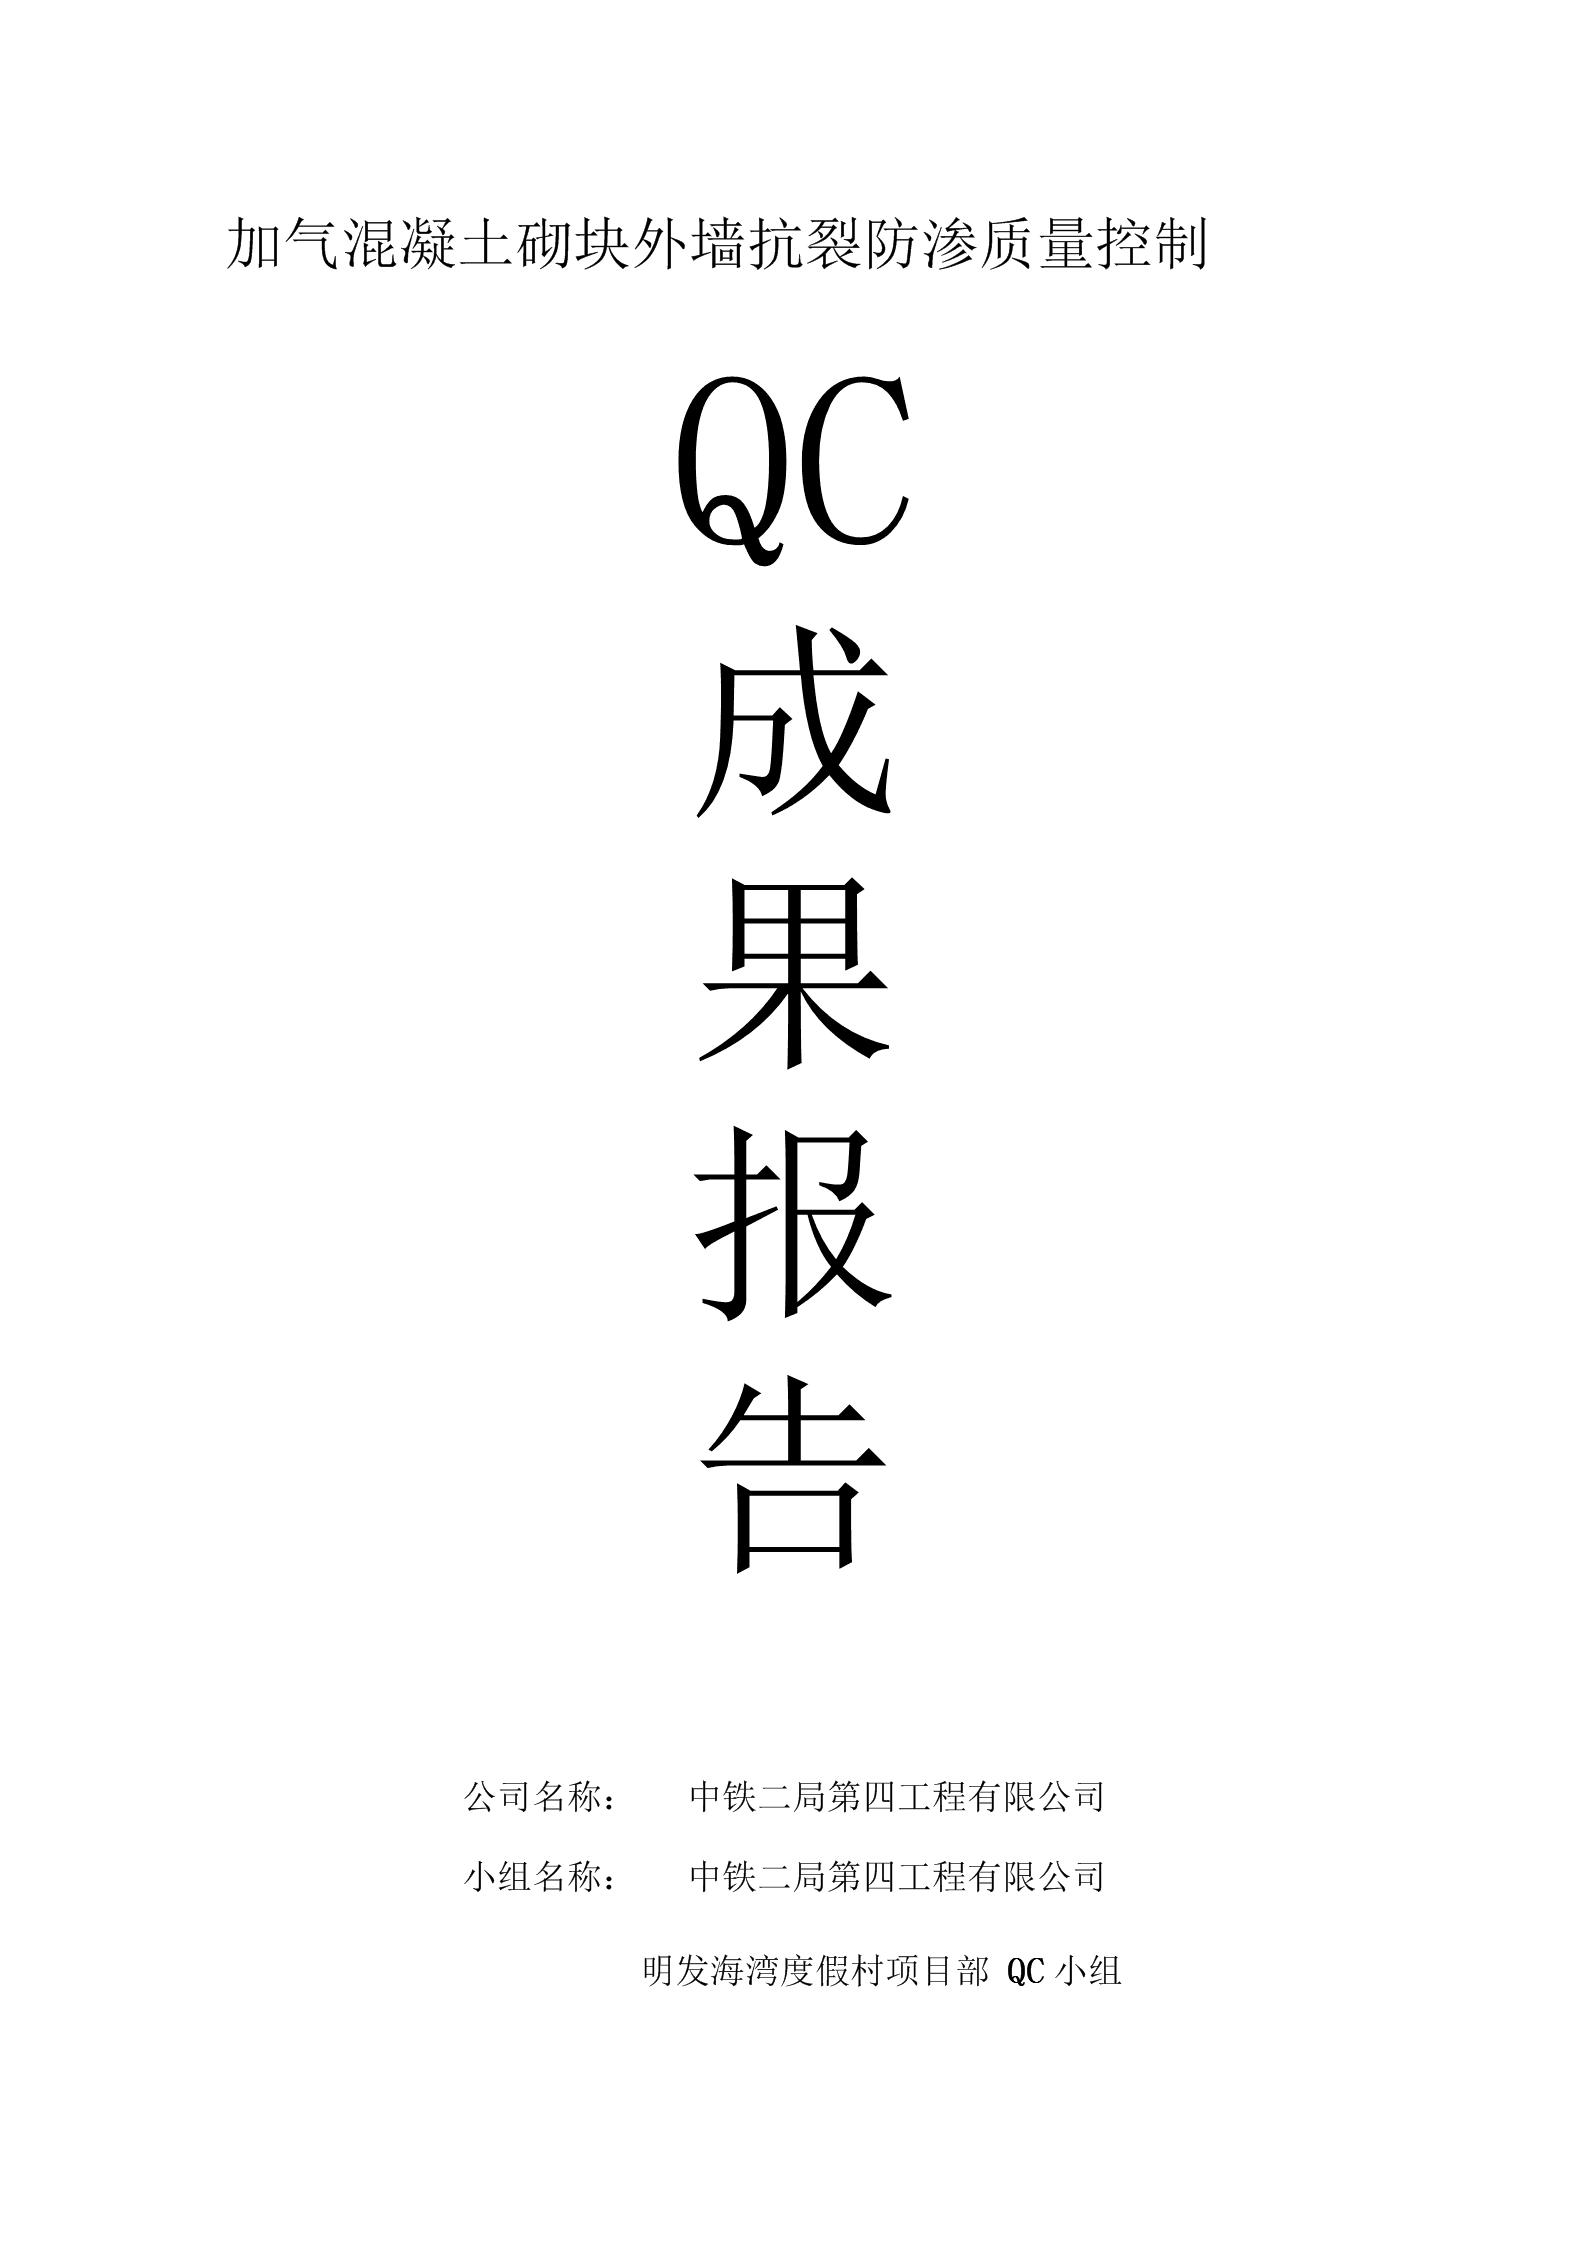 QC——加气混凝土砌块外墙抗裂防渗质量控制.docx